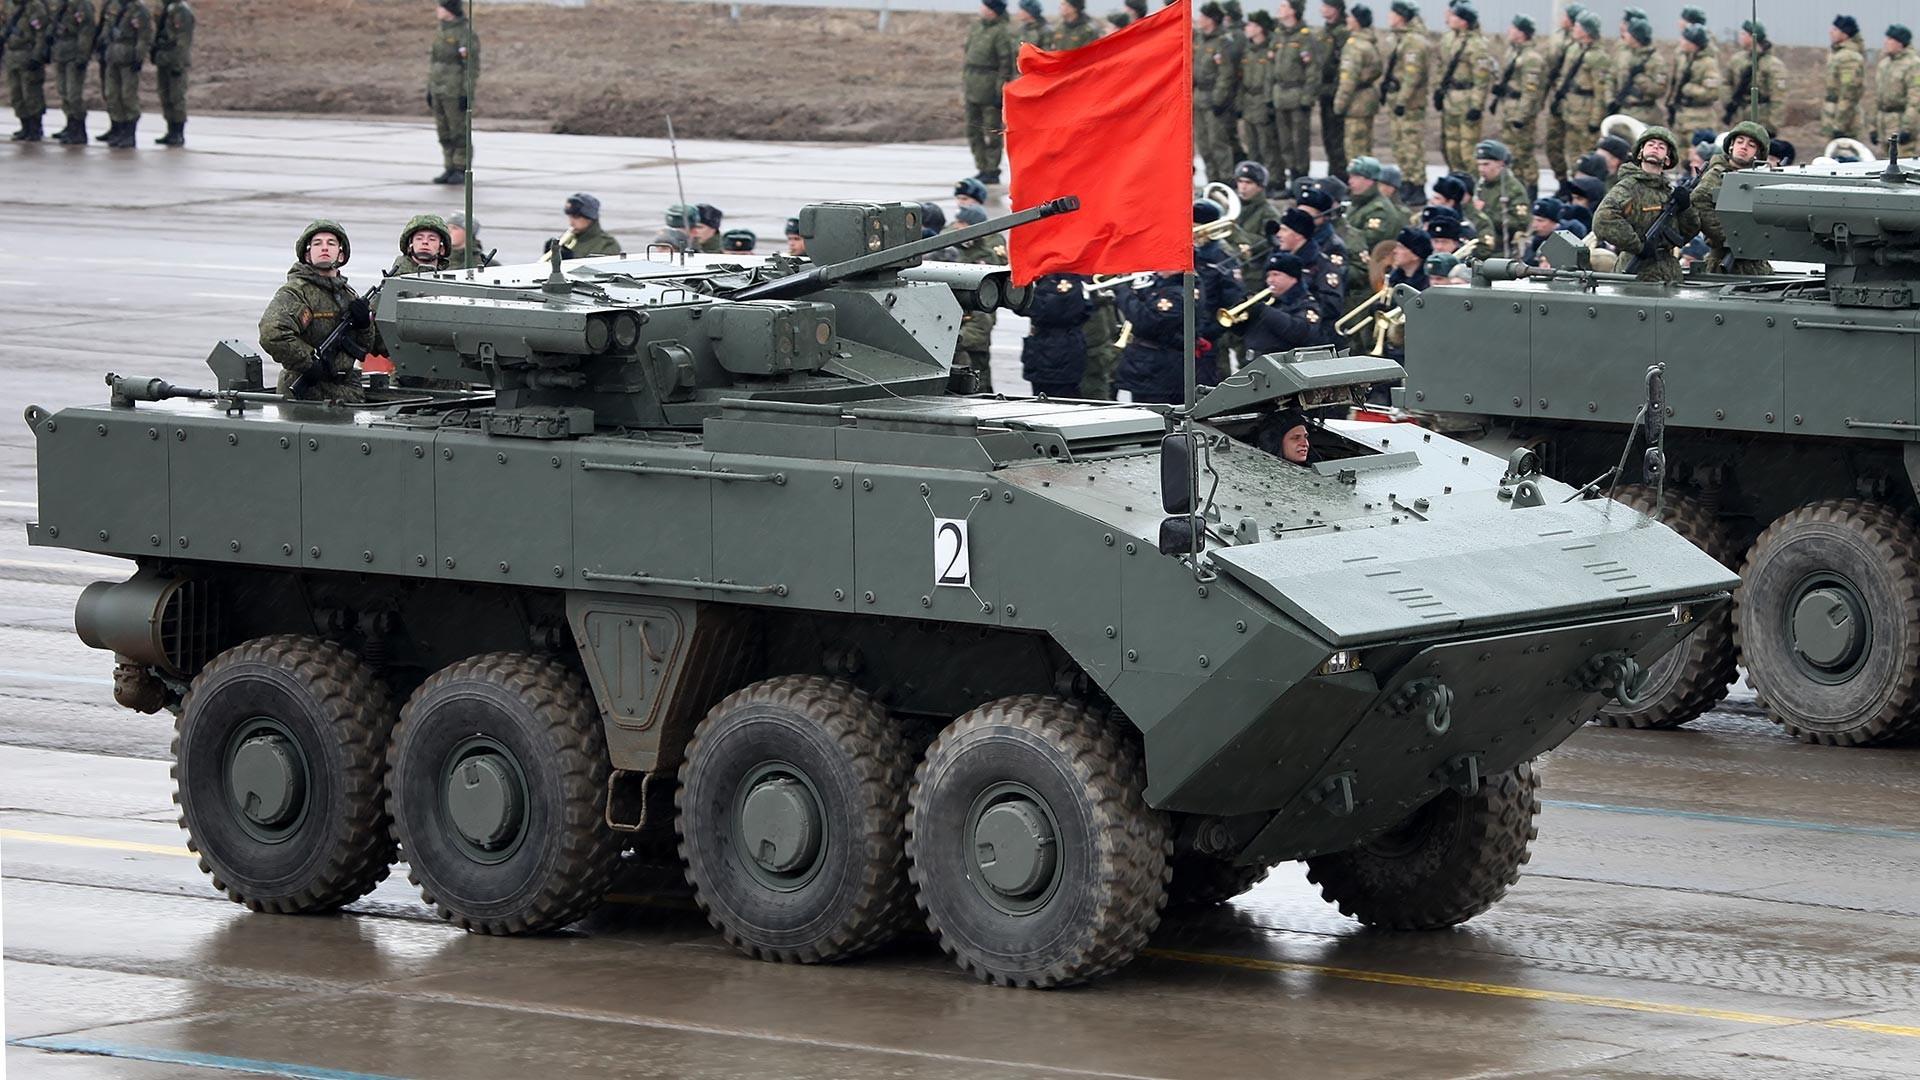 BMP-К К-17 VPK-7829 Bumerang